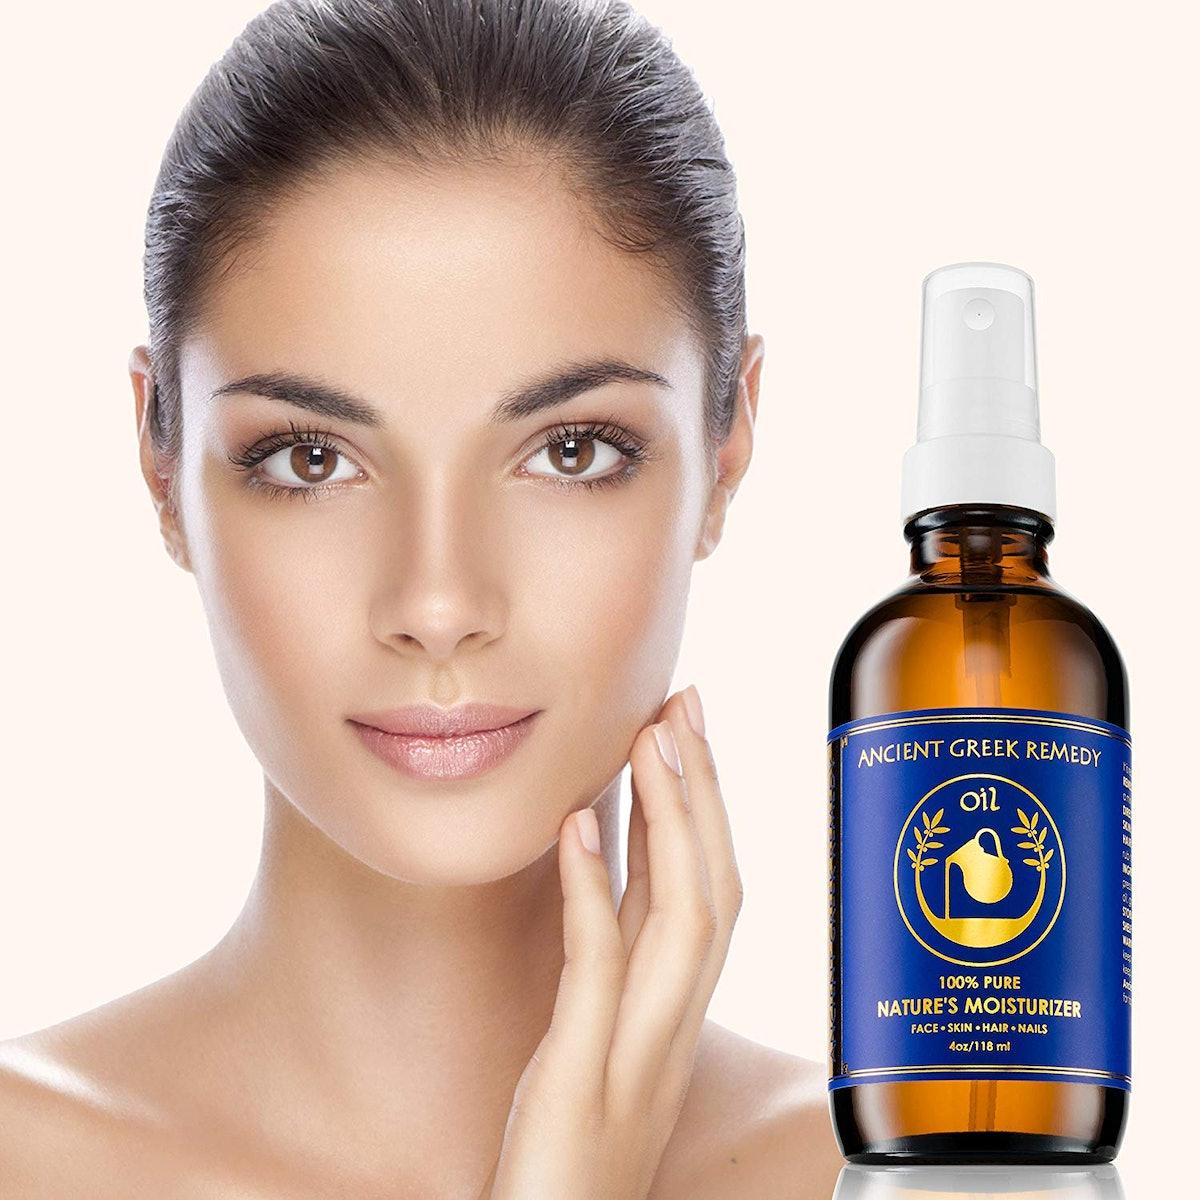 Ancient Greek Remedy Moisturizer for Skin